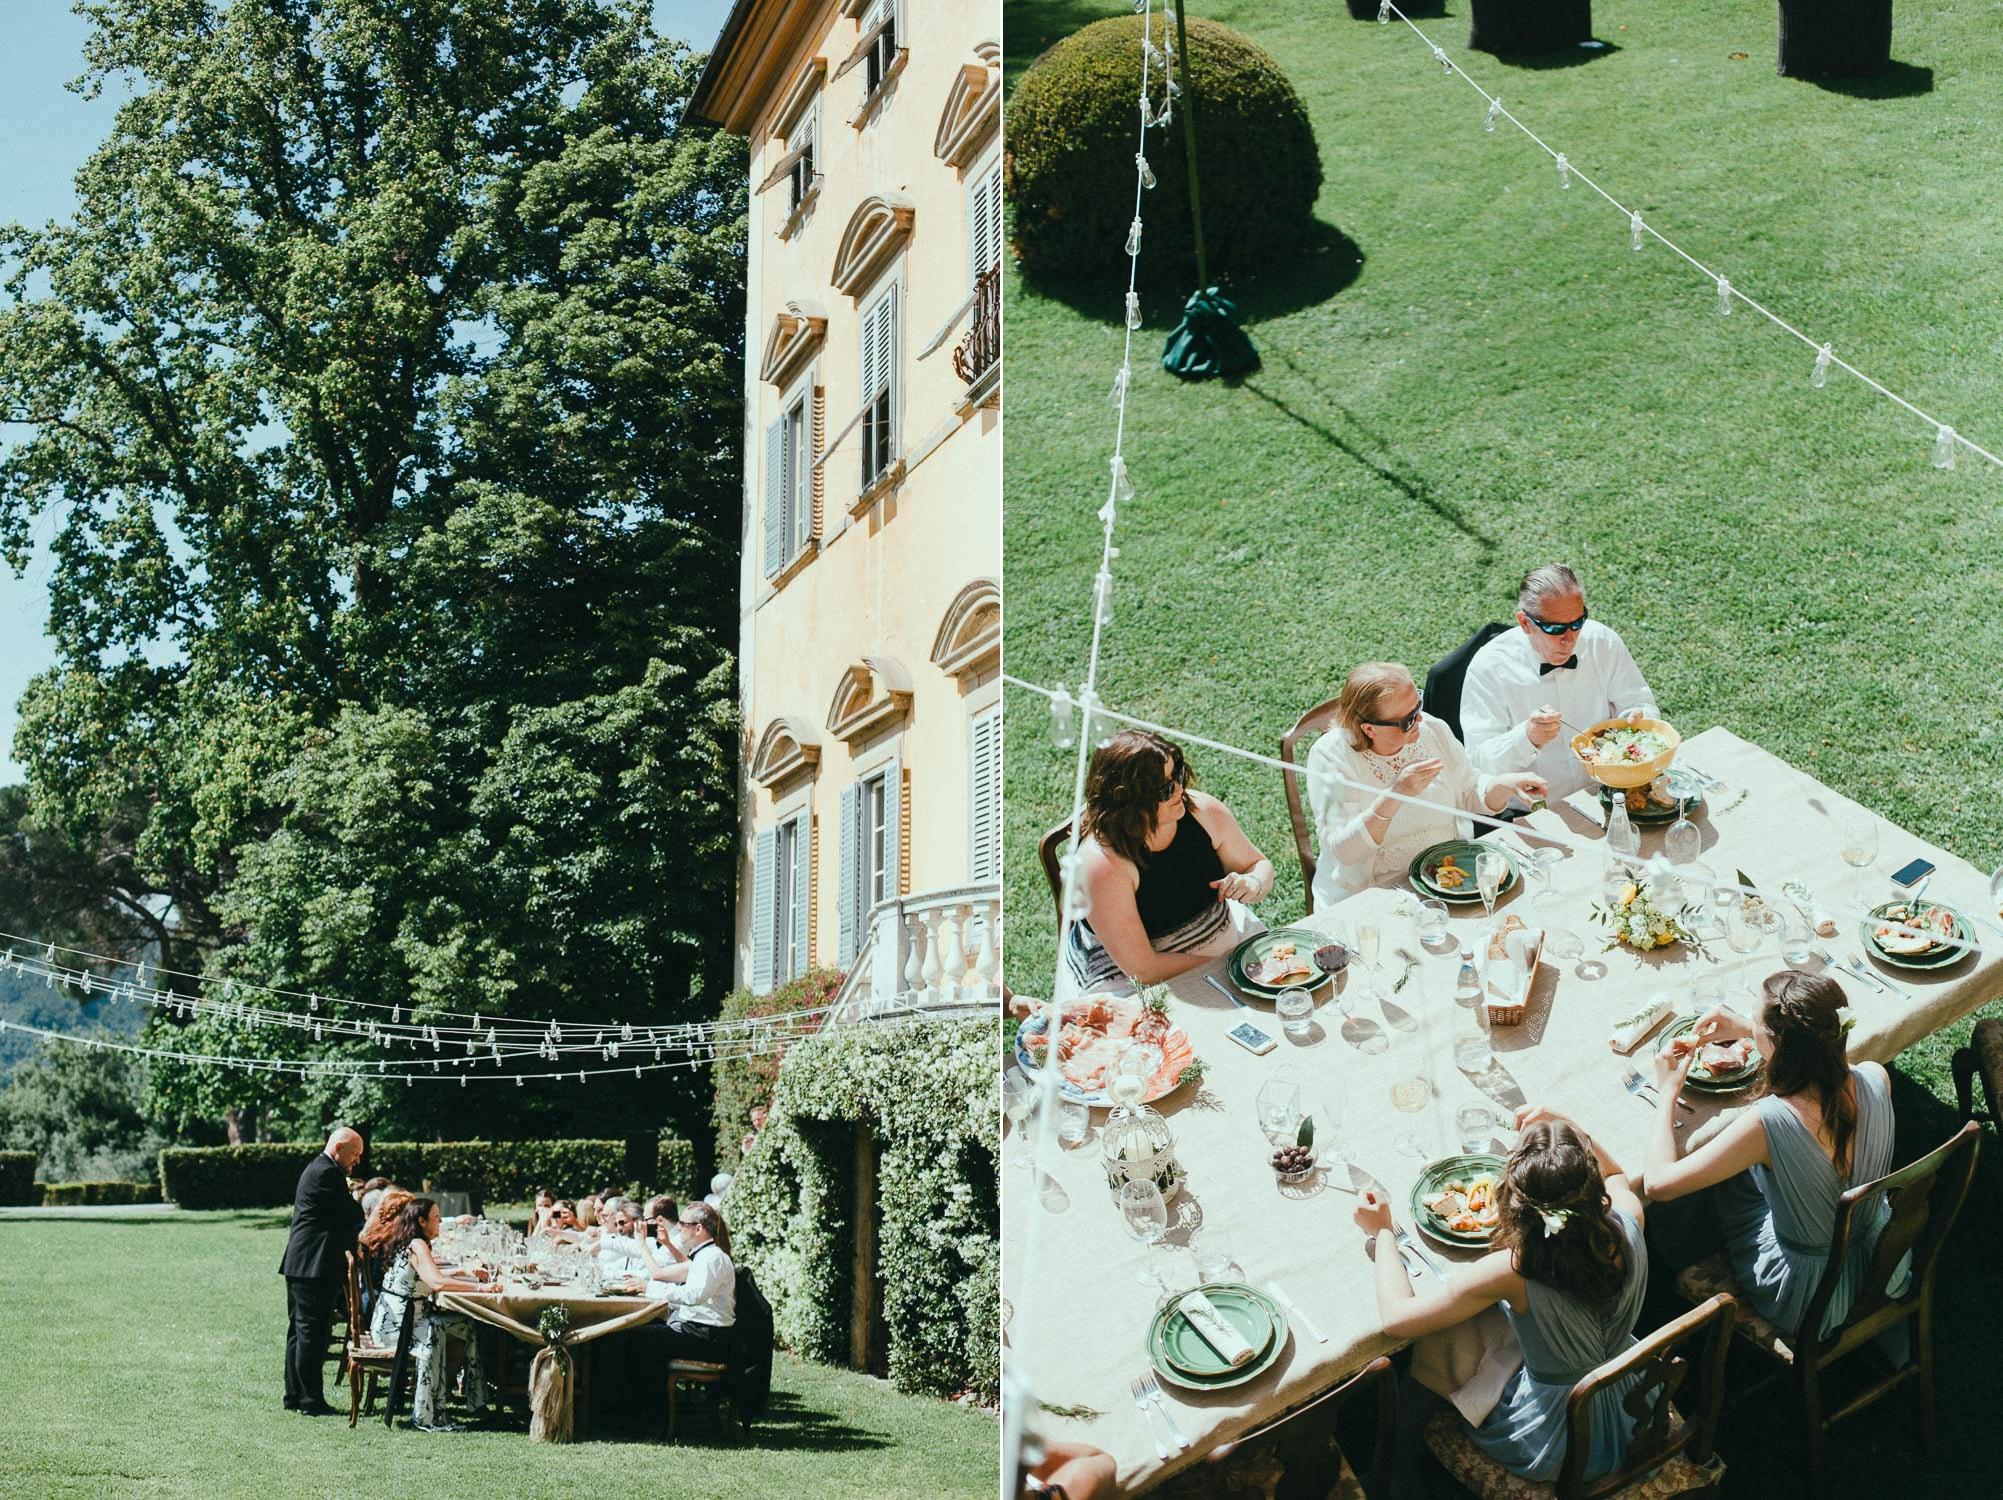 87-wedding-party-details.jpg